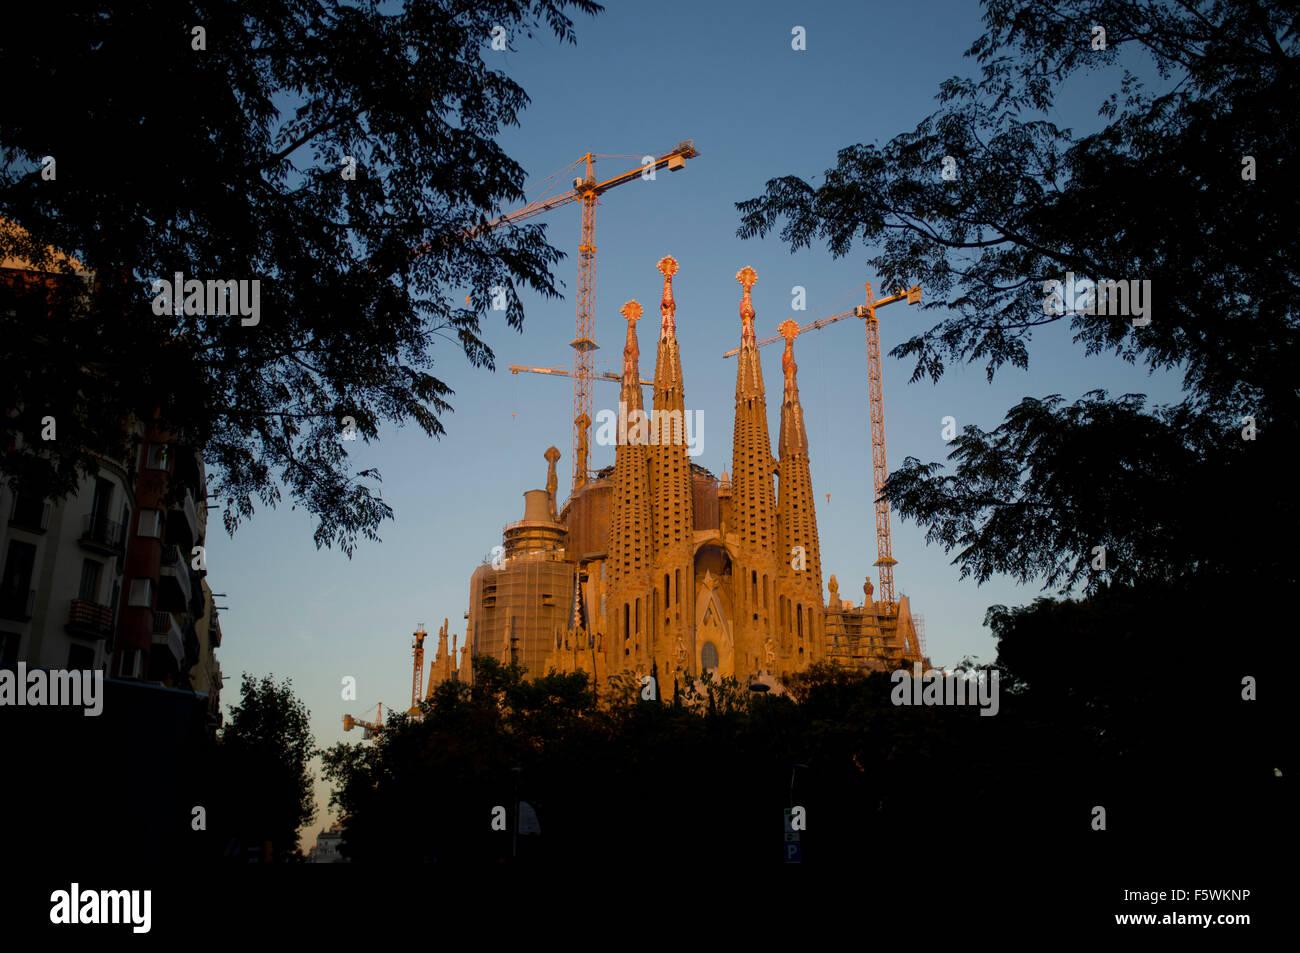 La Sagrada Familia is seen through the trees at sunset in Barcelona. Stock Photo